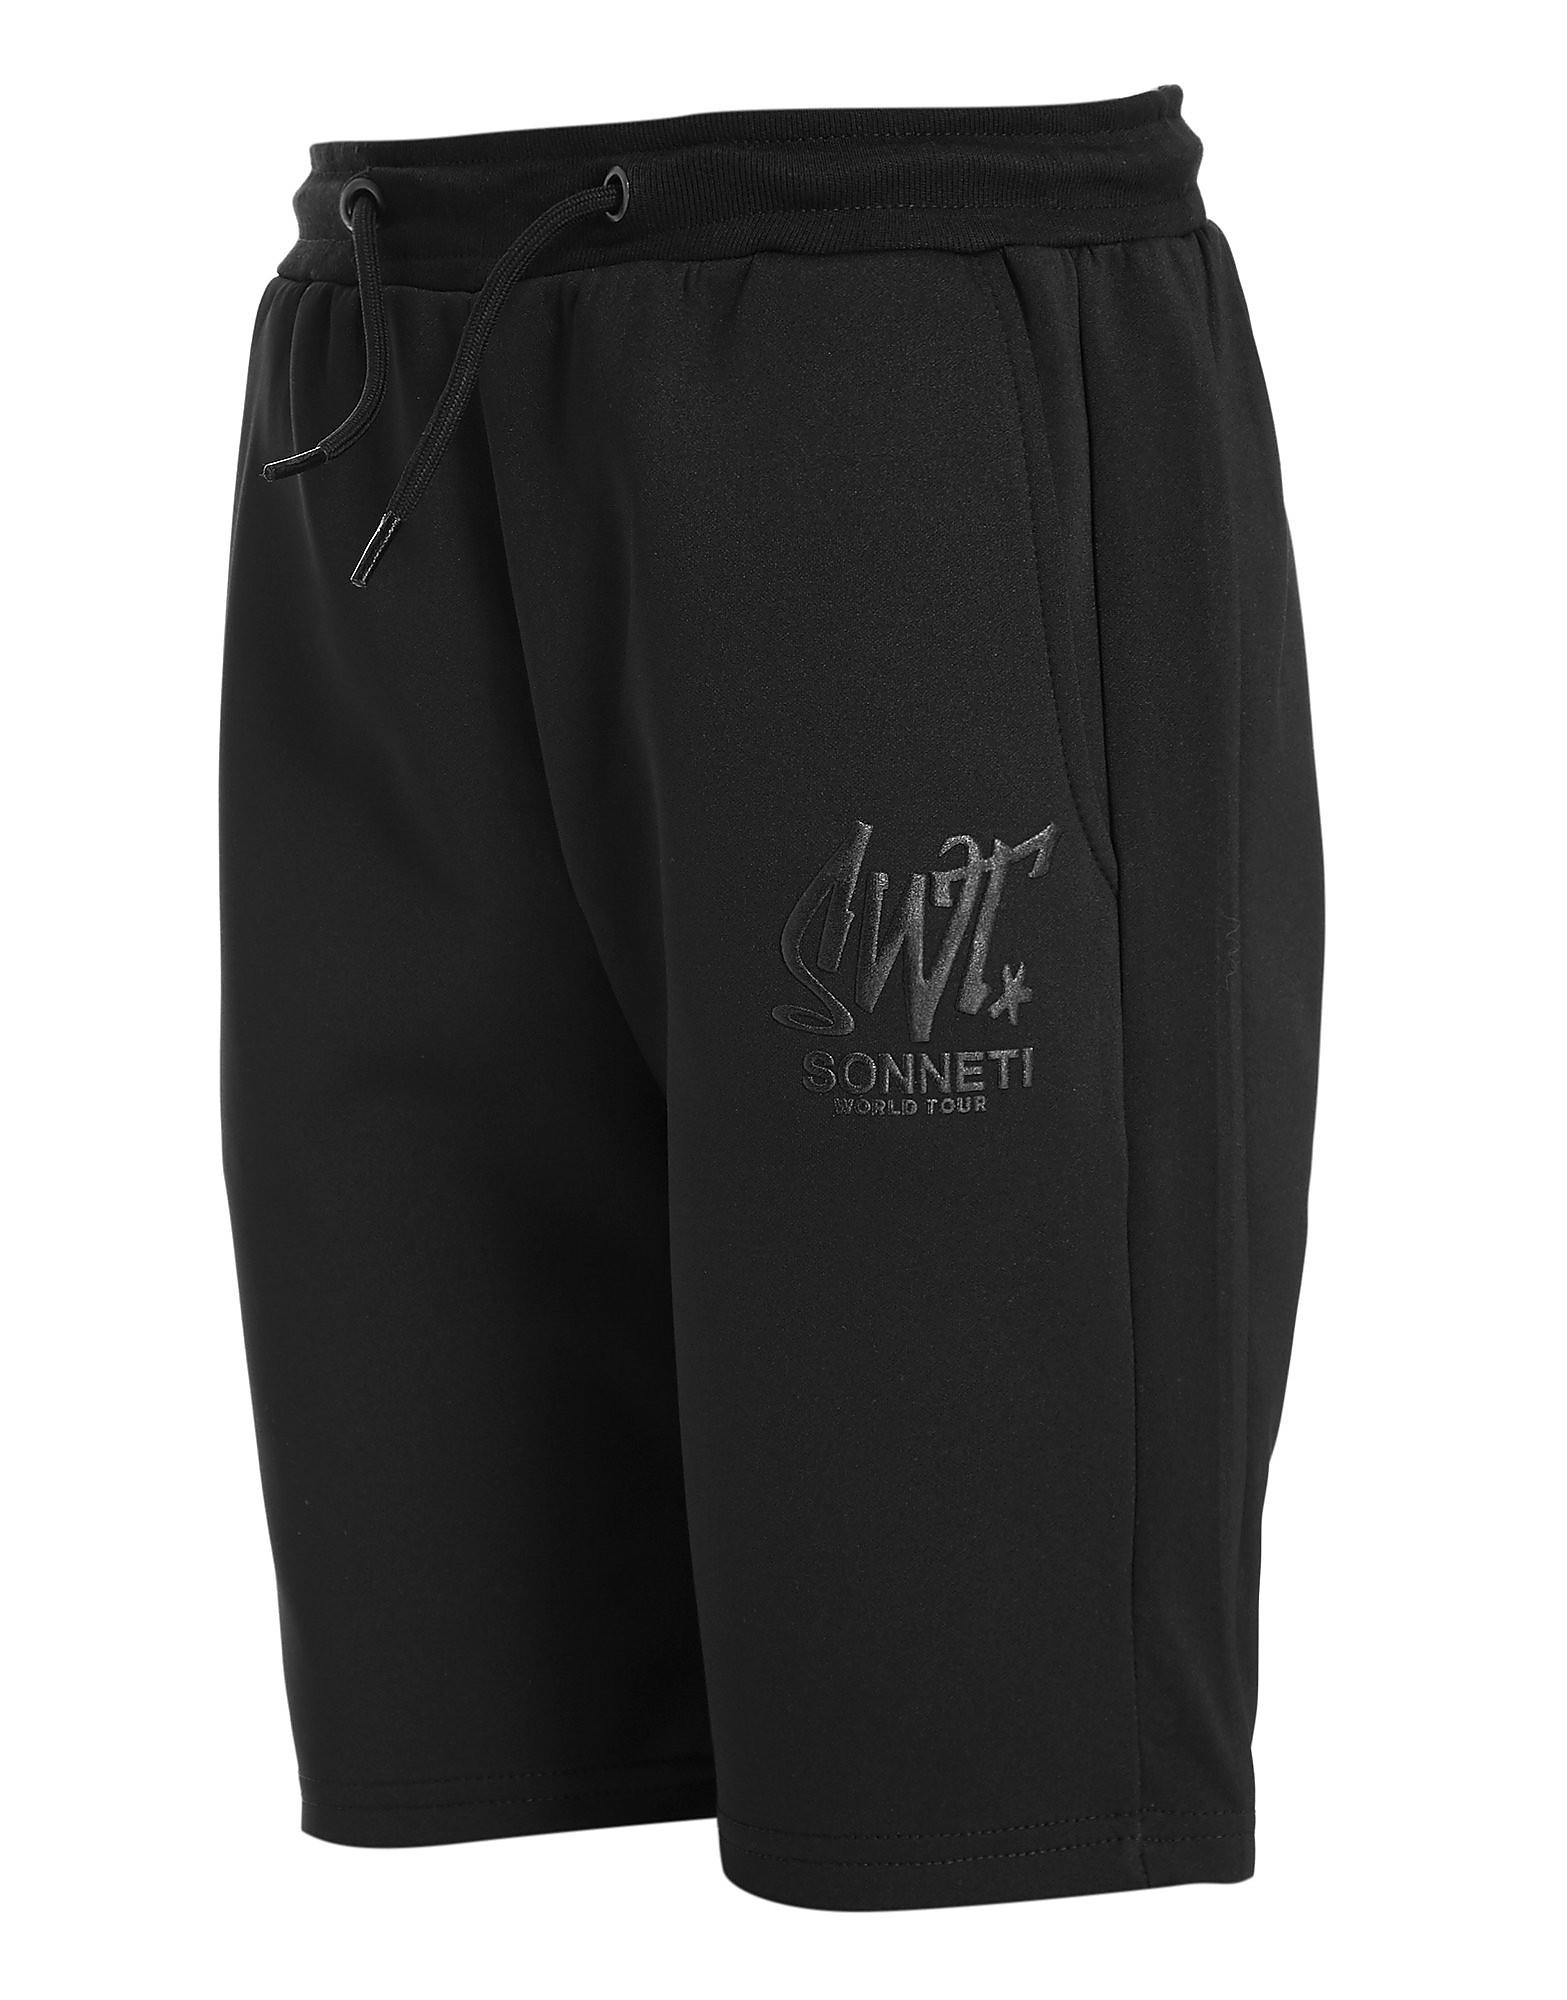 Sonneti Resist Shorts Junior